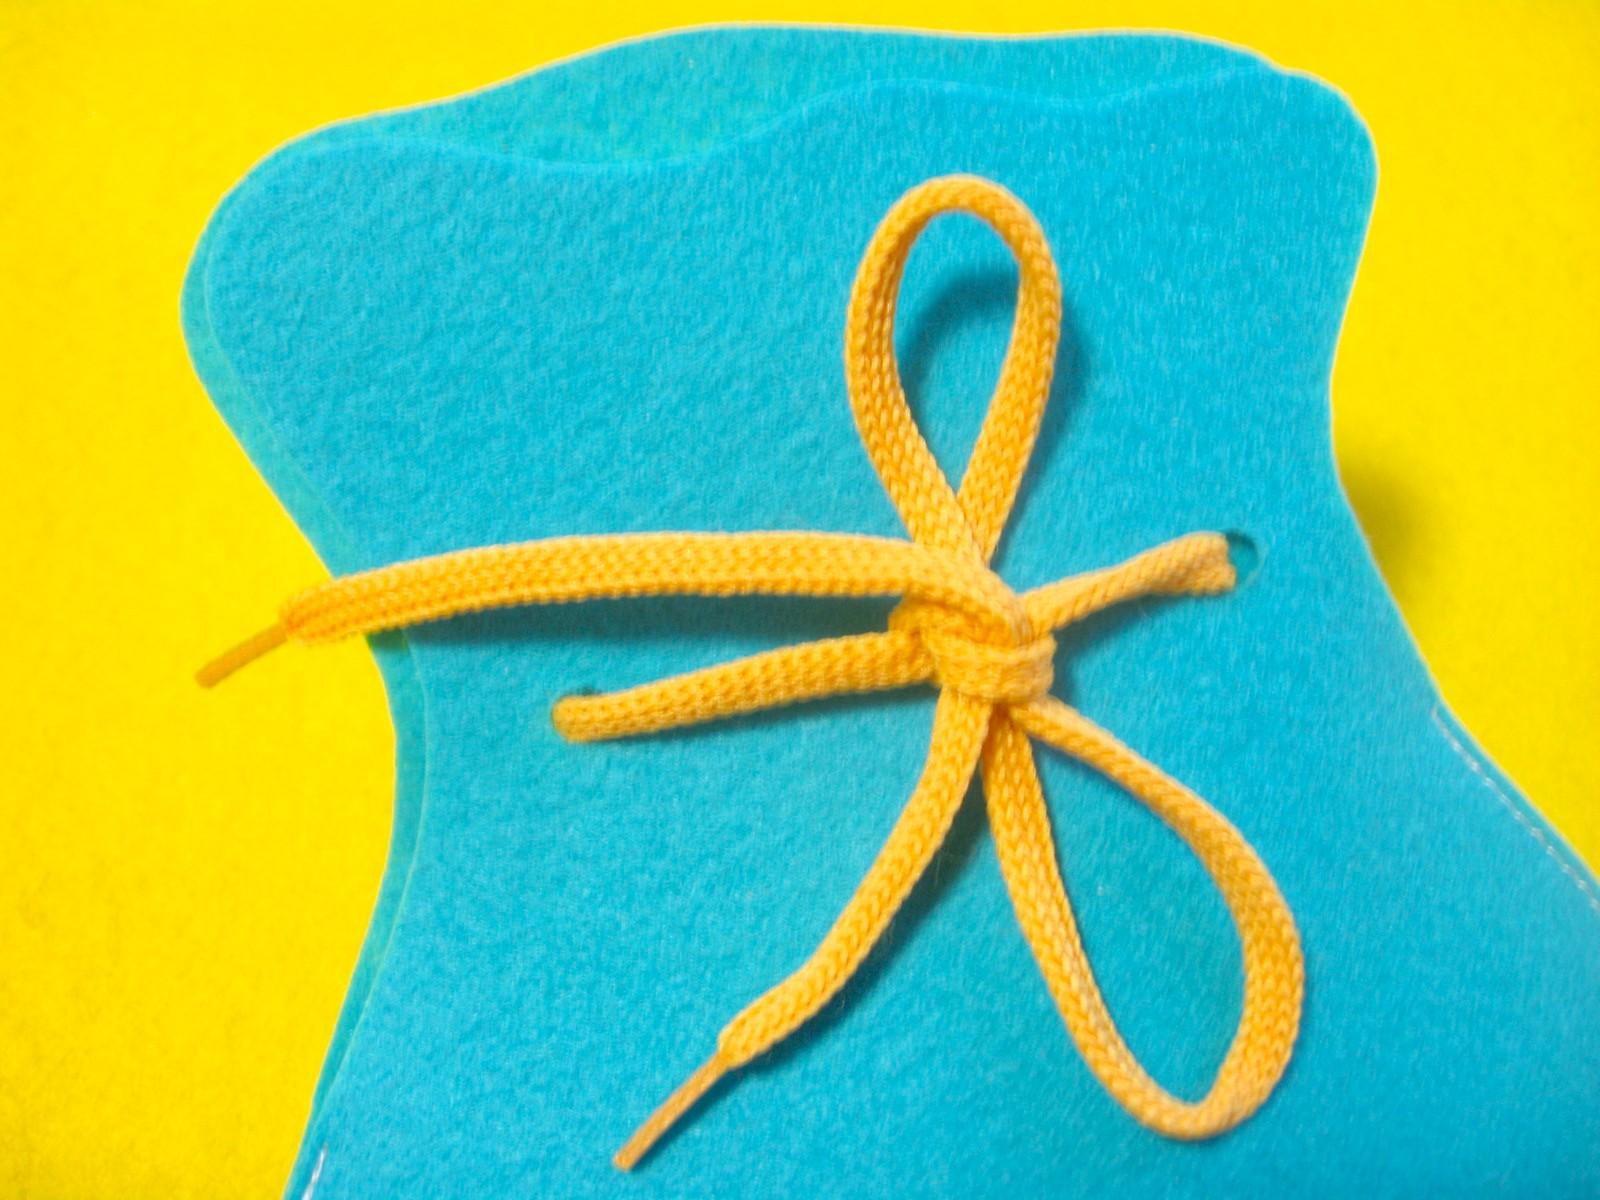 шнуровка из фетра развивающая игрушка